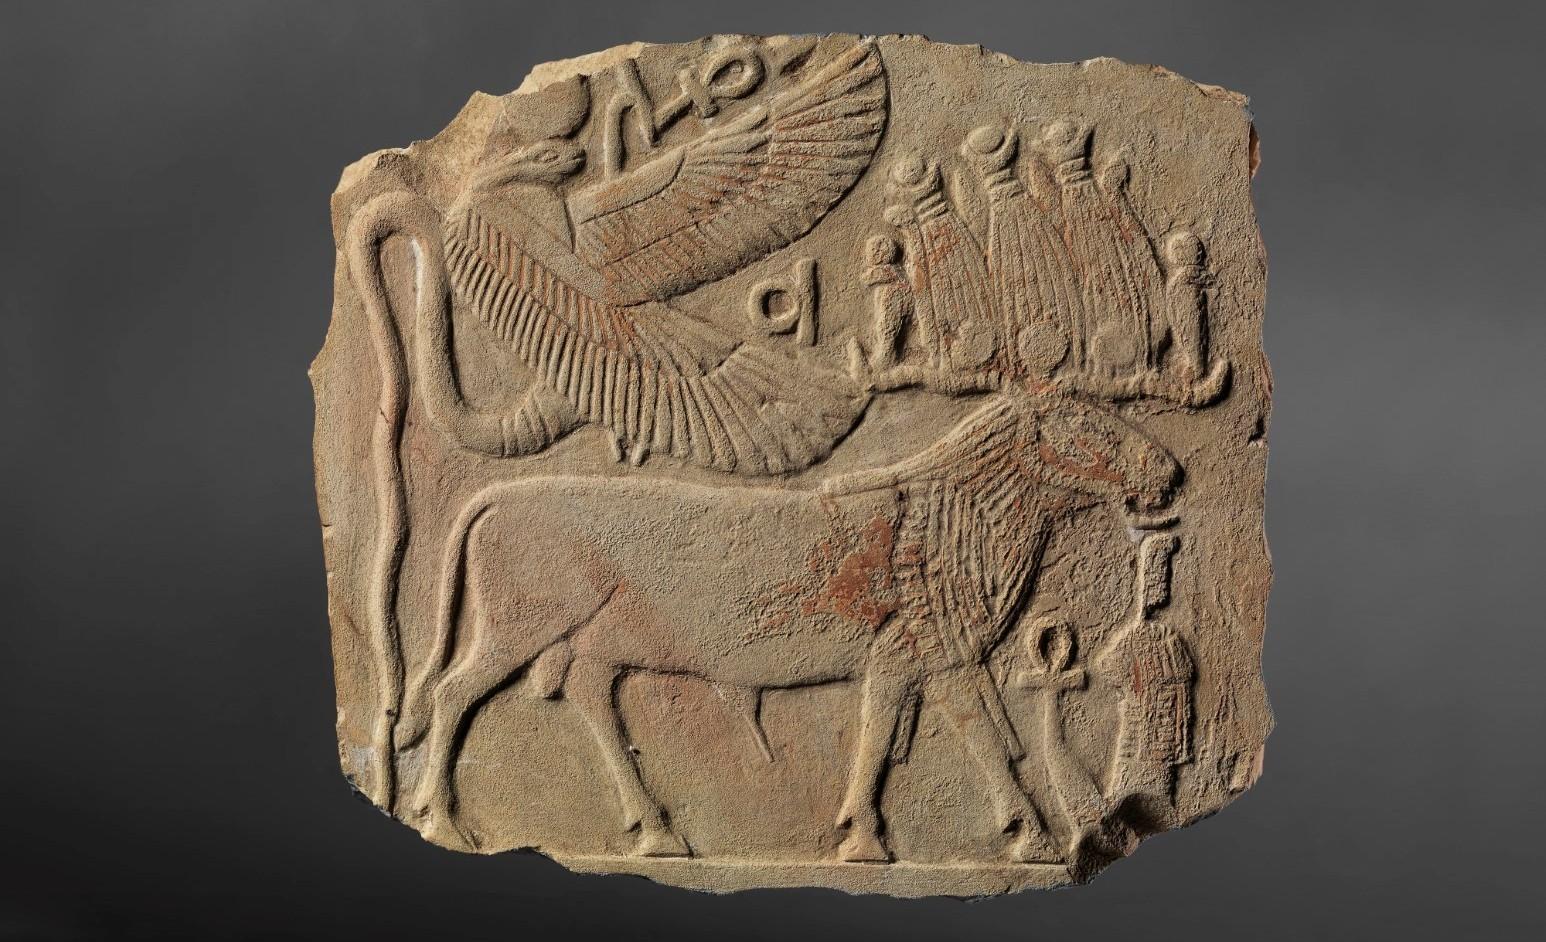 Emoglyphs: from Hieroglyphs to the Emoji